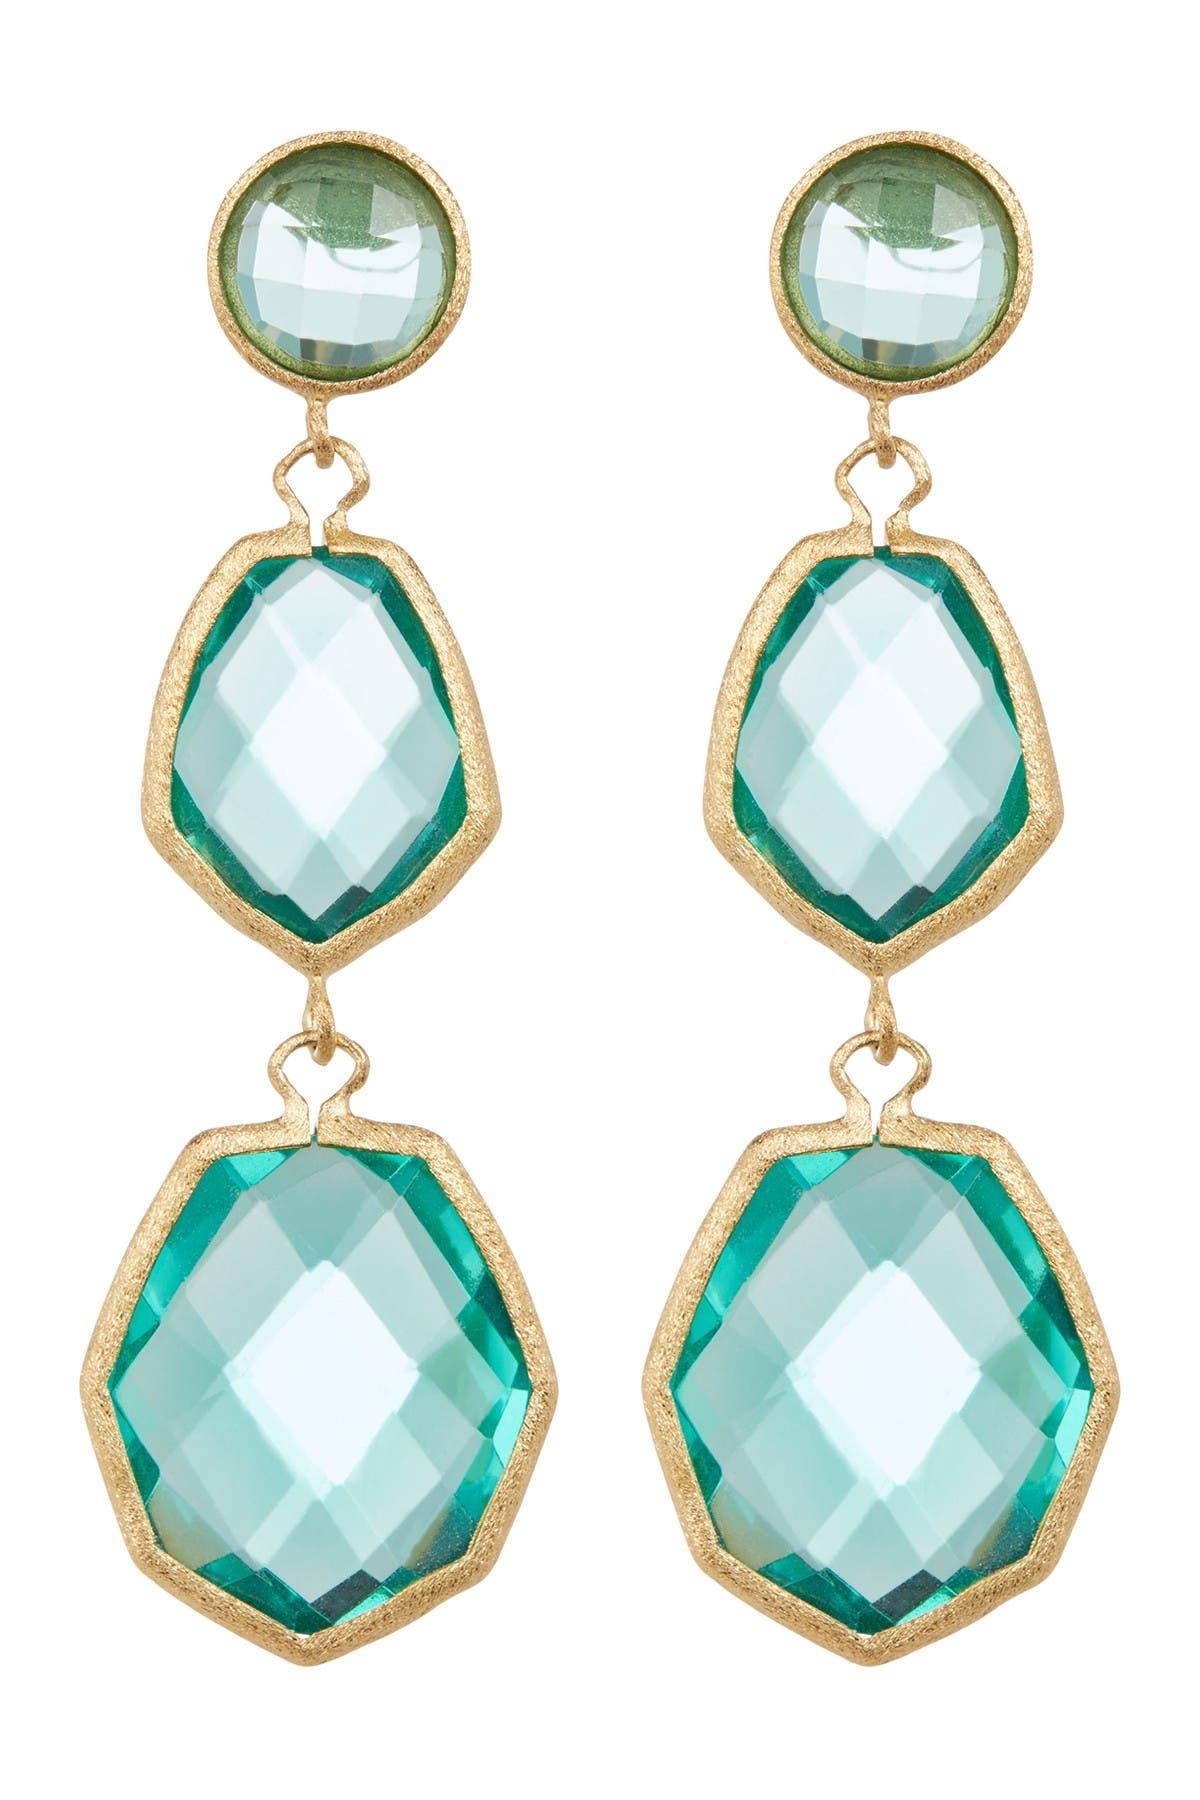 Image of Rivka Friedman 18K Gold Clad Faceted Capri Crystal Triple Dangle Deco Earrings